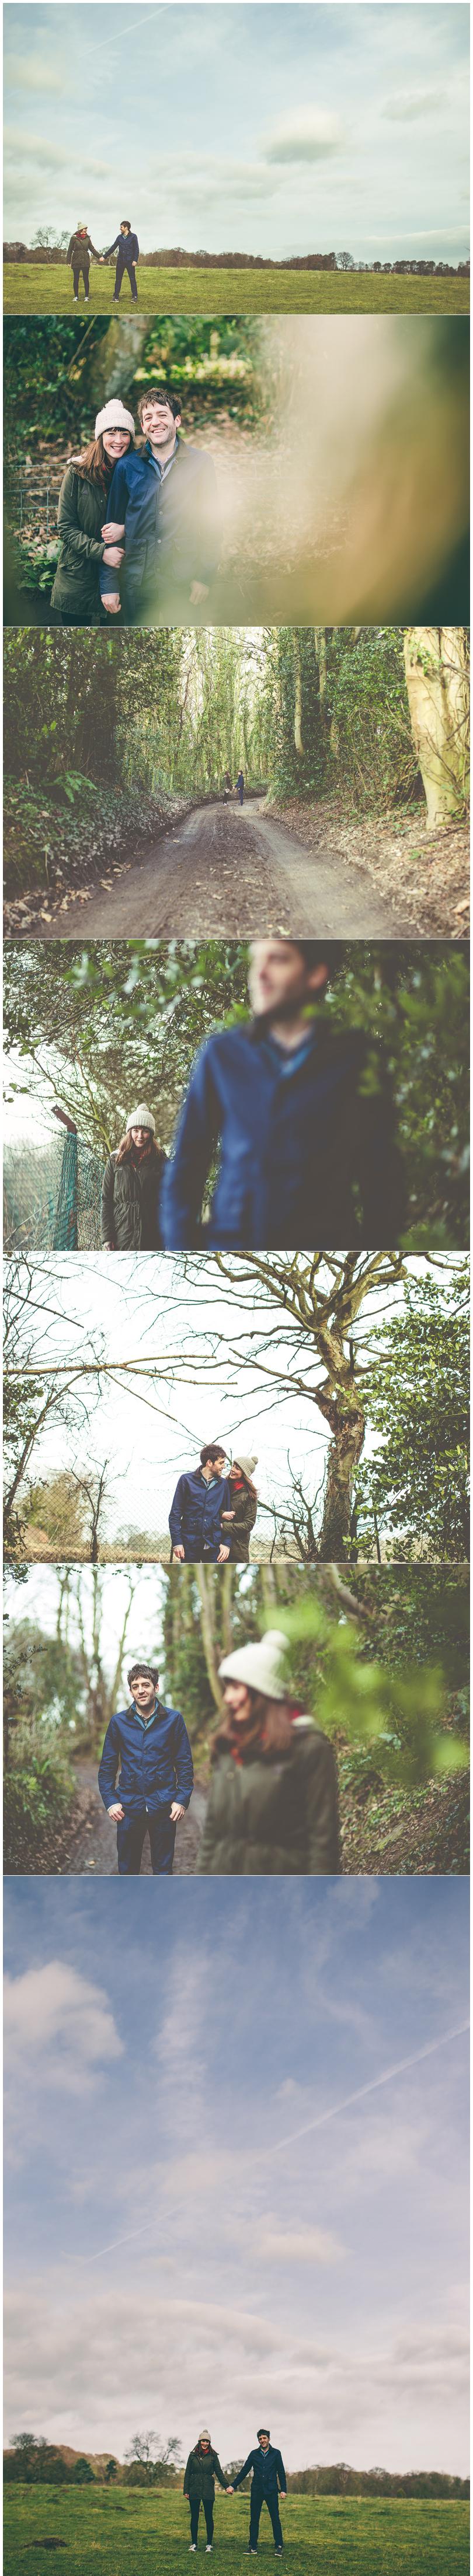 Neil_Jackson_Photographic_Scarborough_York_Yorkshire_Wedding_Photographer_Susie_Jamie_Scalby_South_Bay_Scarborough_Blog1